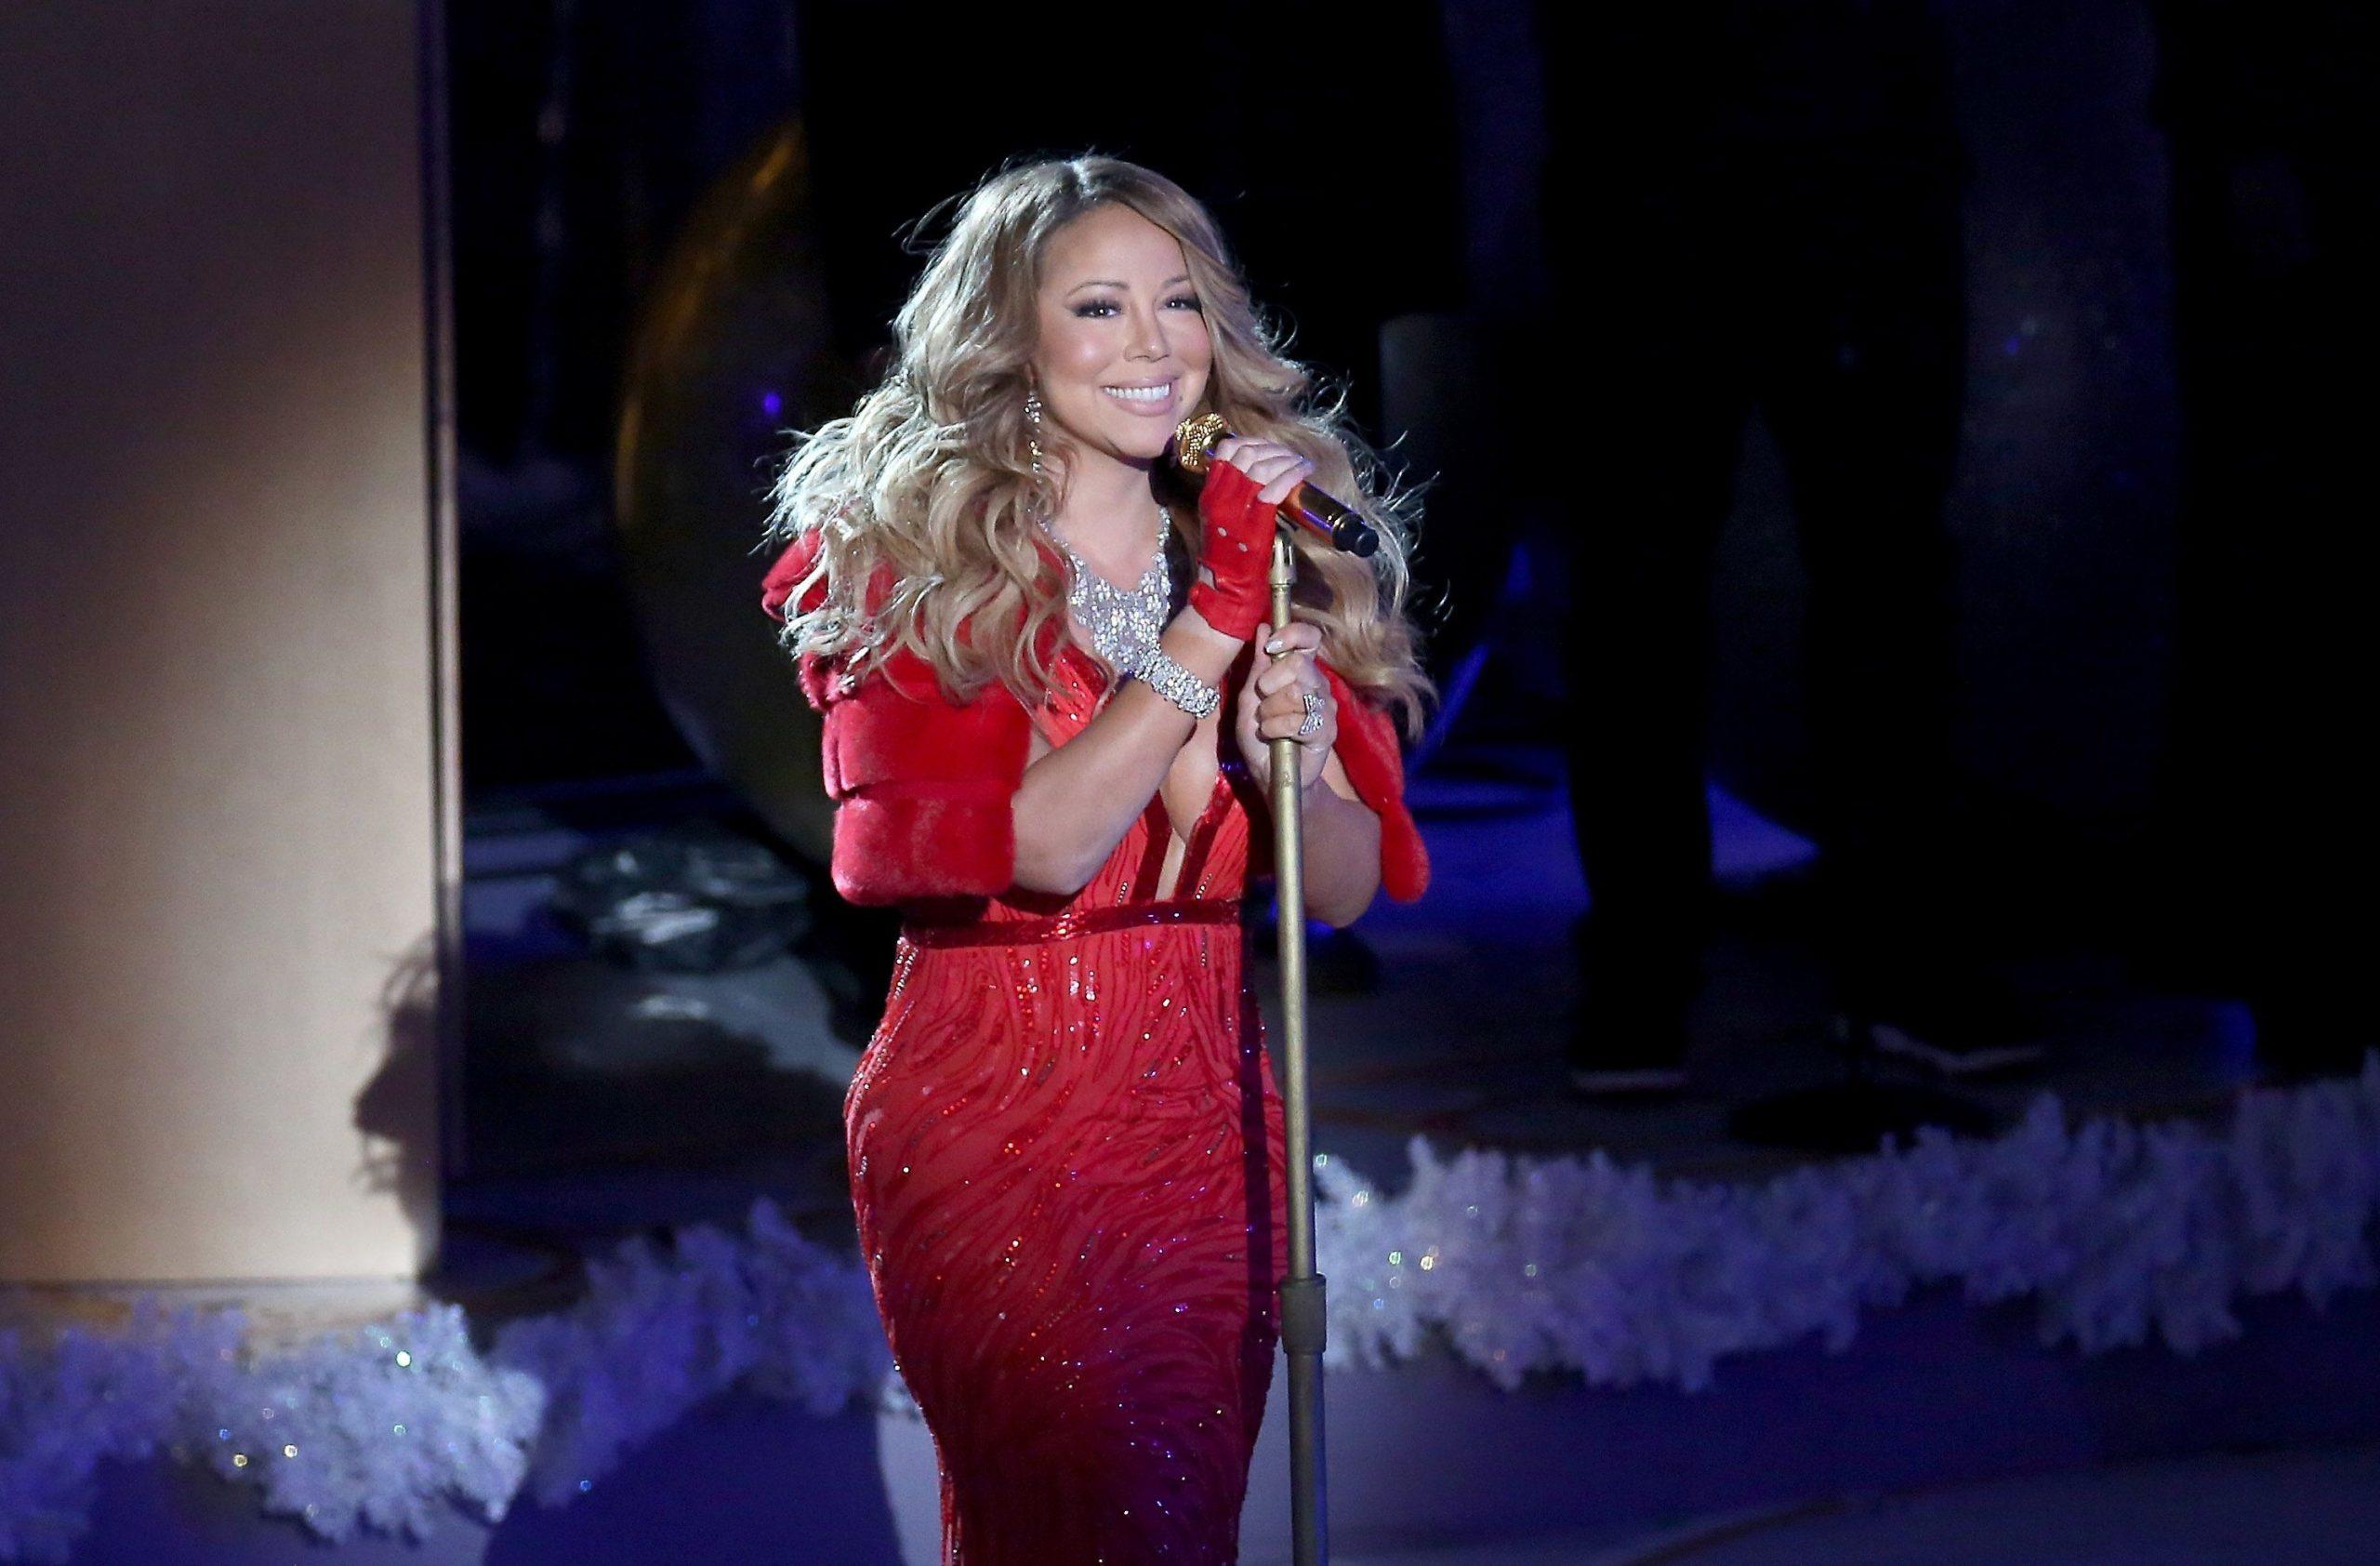 Mariah Carey Red Dress Wallpapers